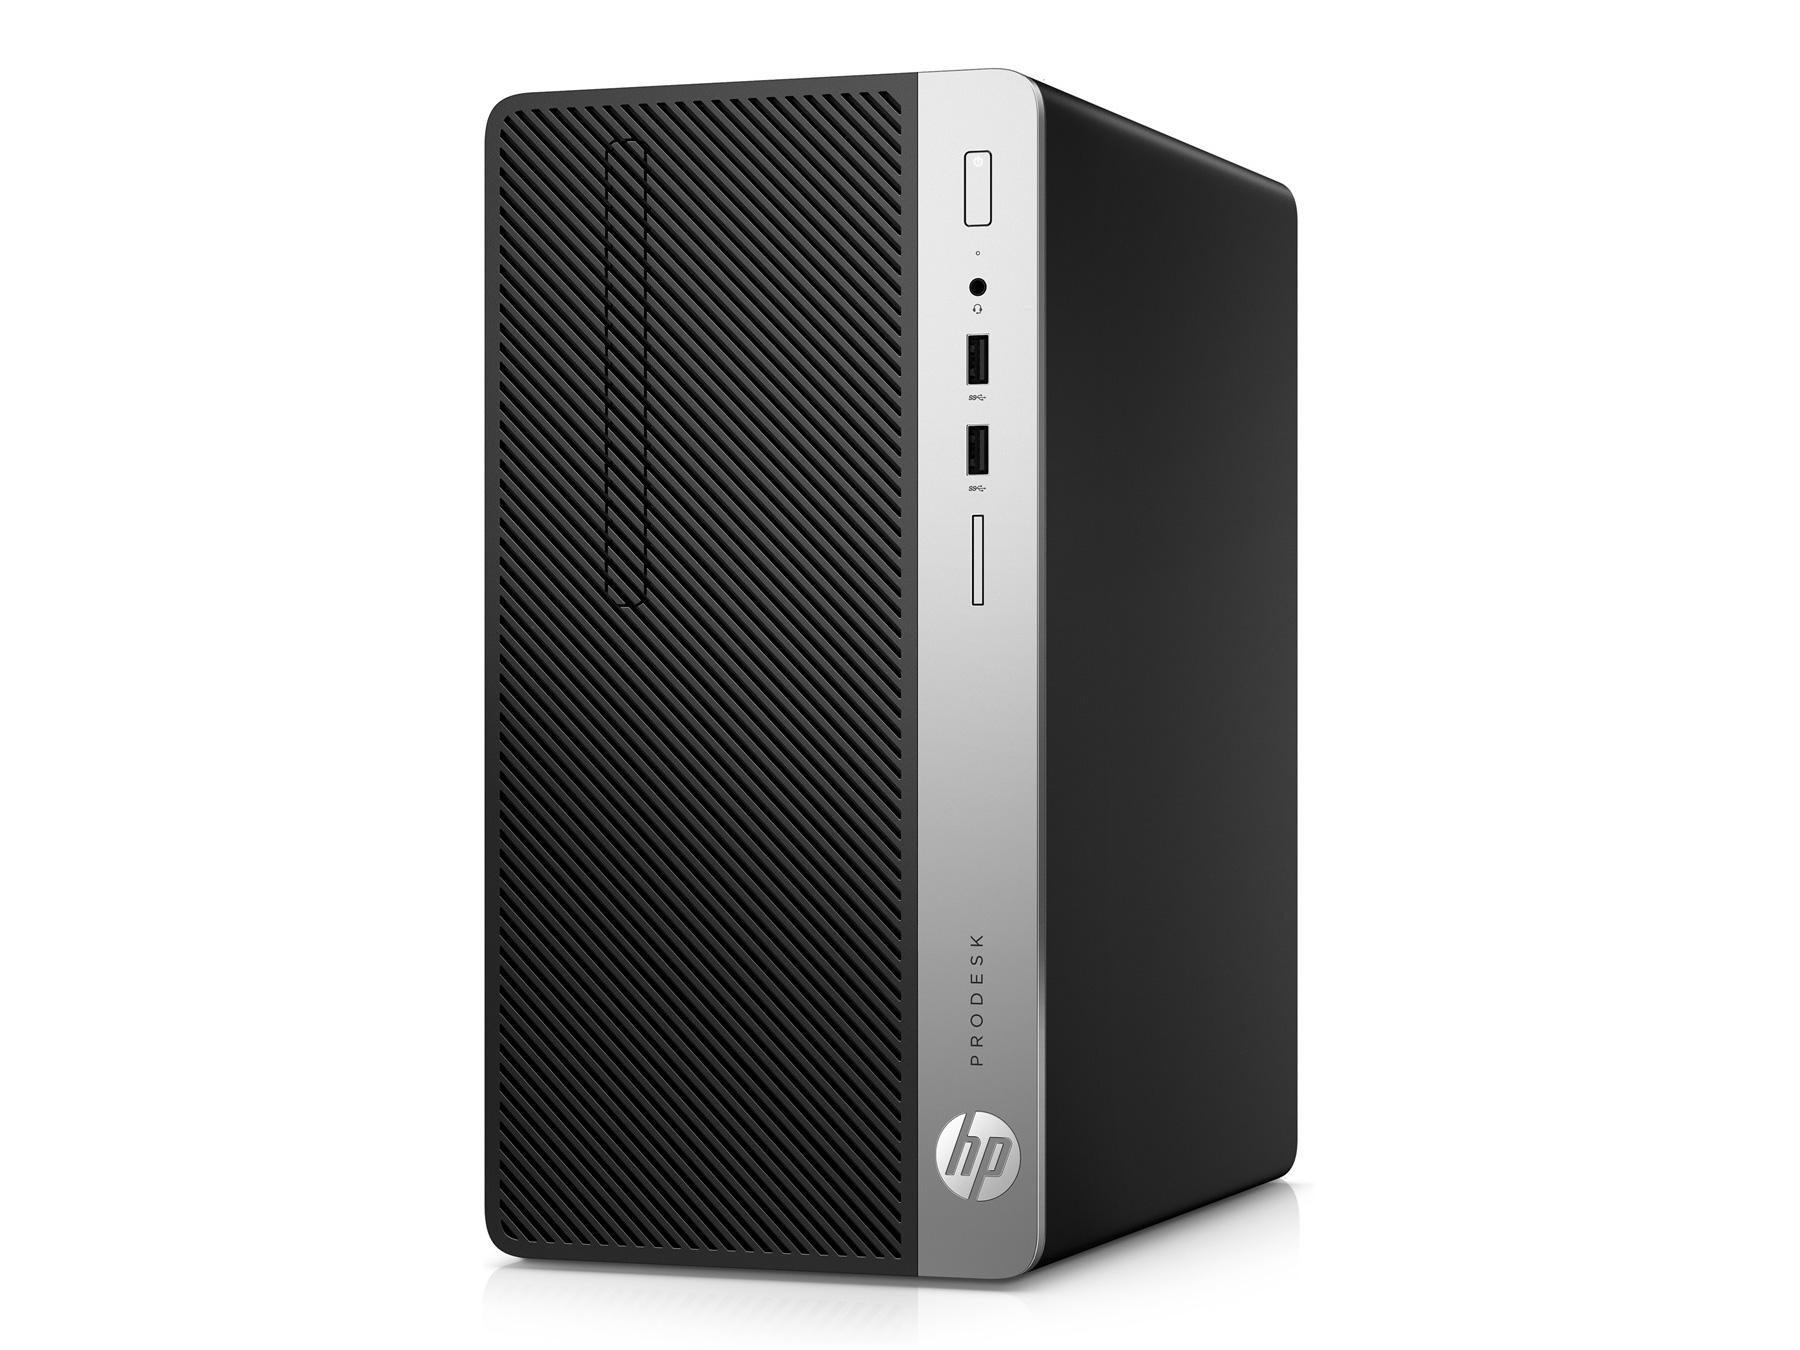 Máy bộ HP ProDesk 400 G4 MT - 1HT55PA - i7-7700(4*3.6)/8GD4/1T7+8GSSD/DVDRW/KB/M/ĐEN/DOS